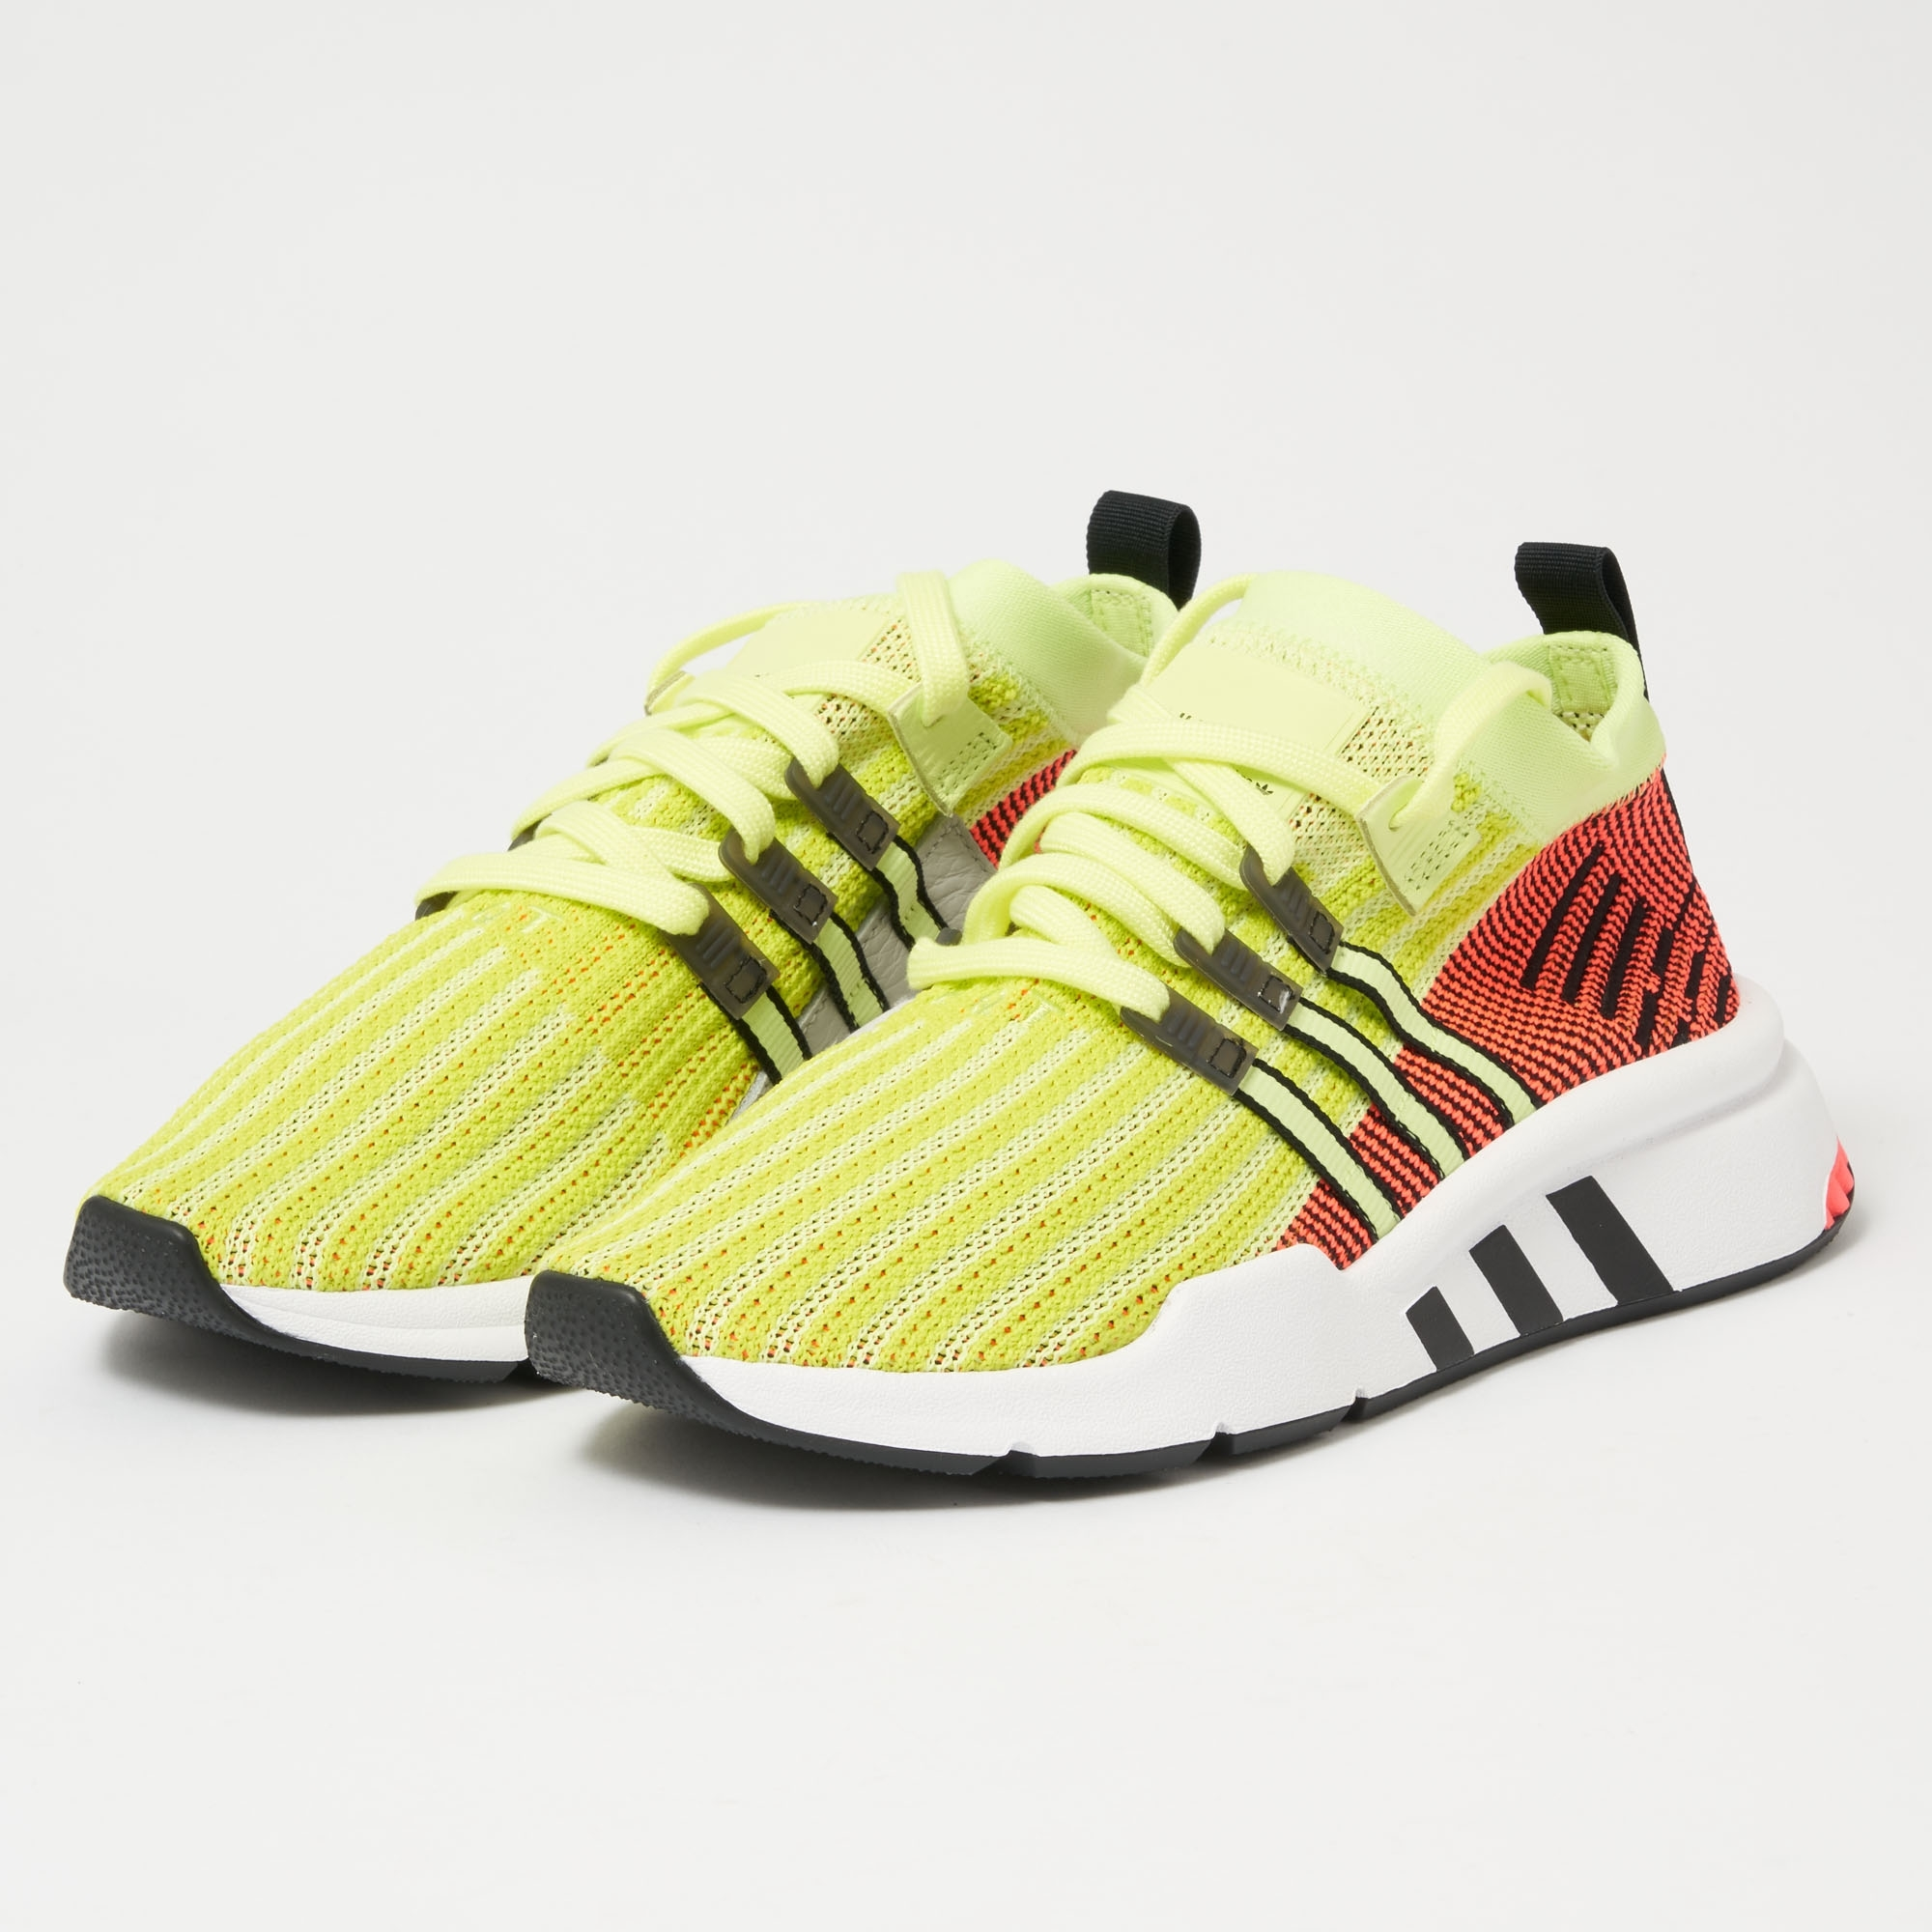 sports shoes d52fc 2b6a0 EQT Support MID ADV Primeknit